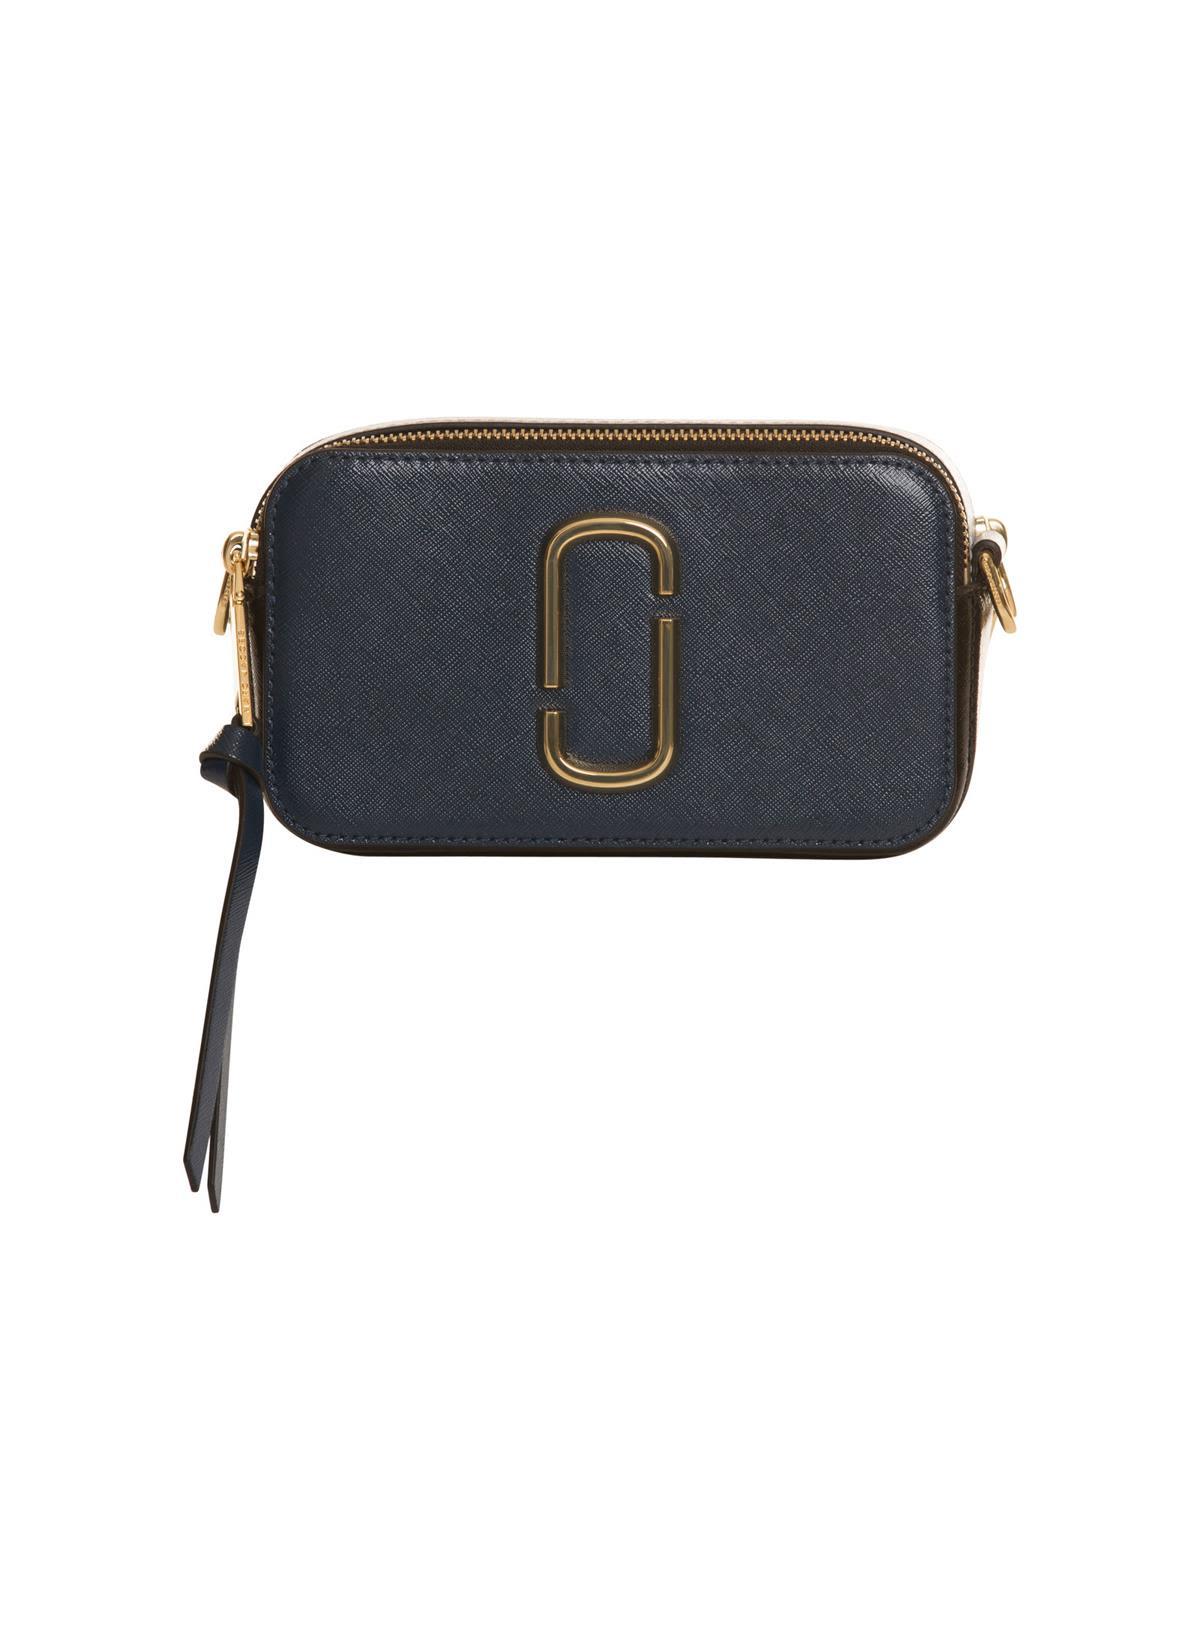 4ae45fb87b3f Marc Jacobs Logo Strap Snapshot Small Camera Bag In Black - Black ...